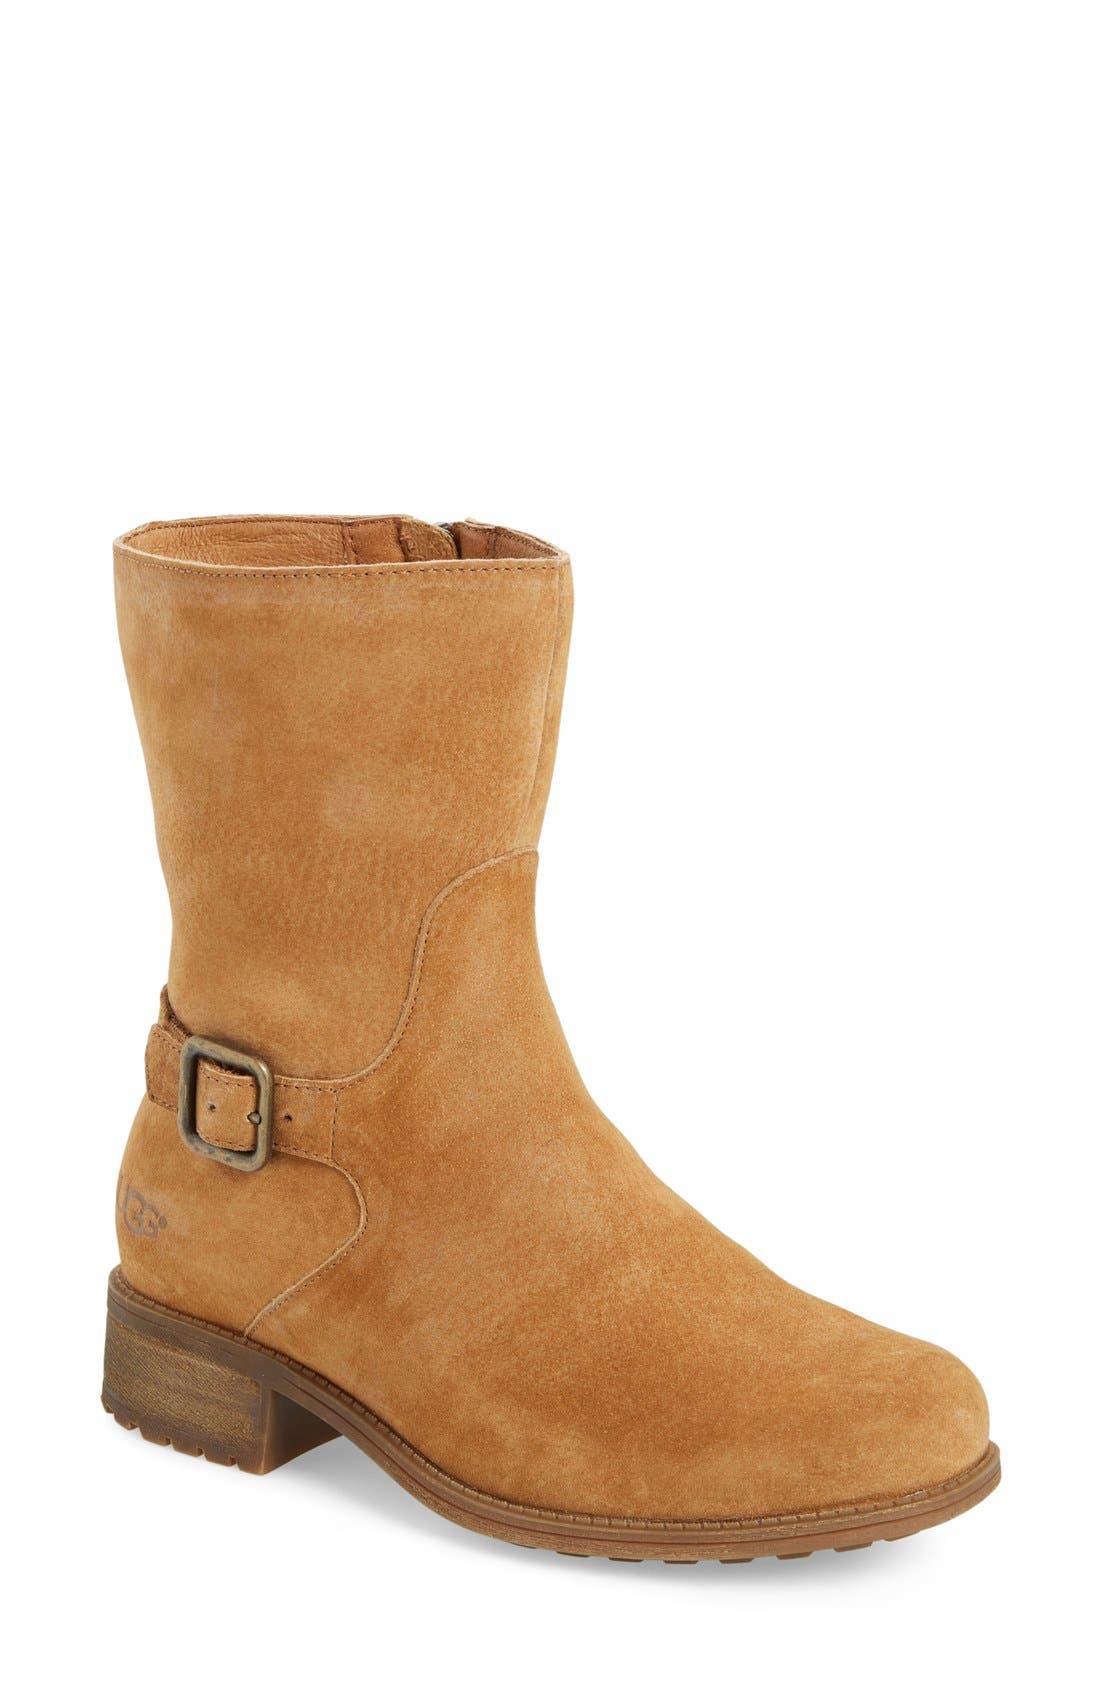 Alternate Image 1 Selected - UGG® Keppler Genuine Shearling Lined Moto Boot (Women)